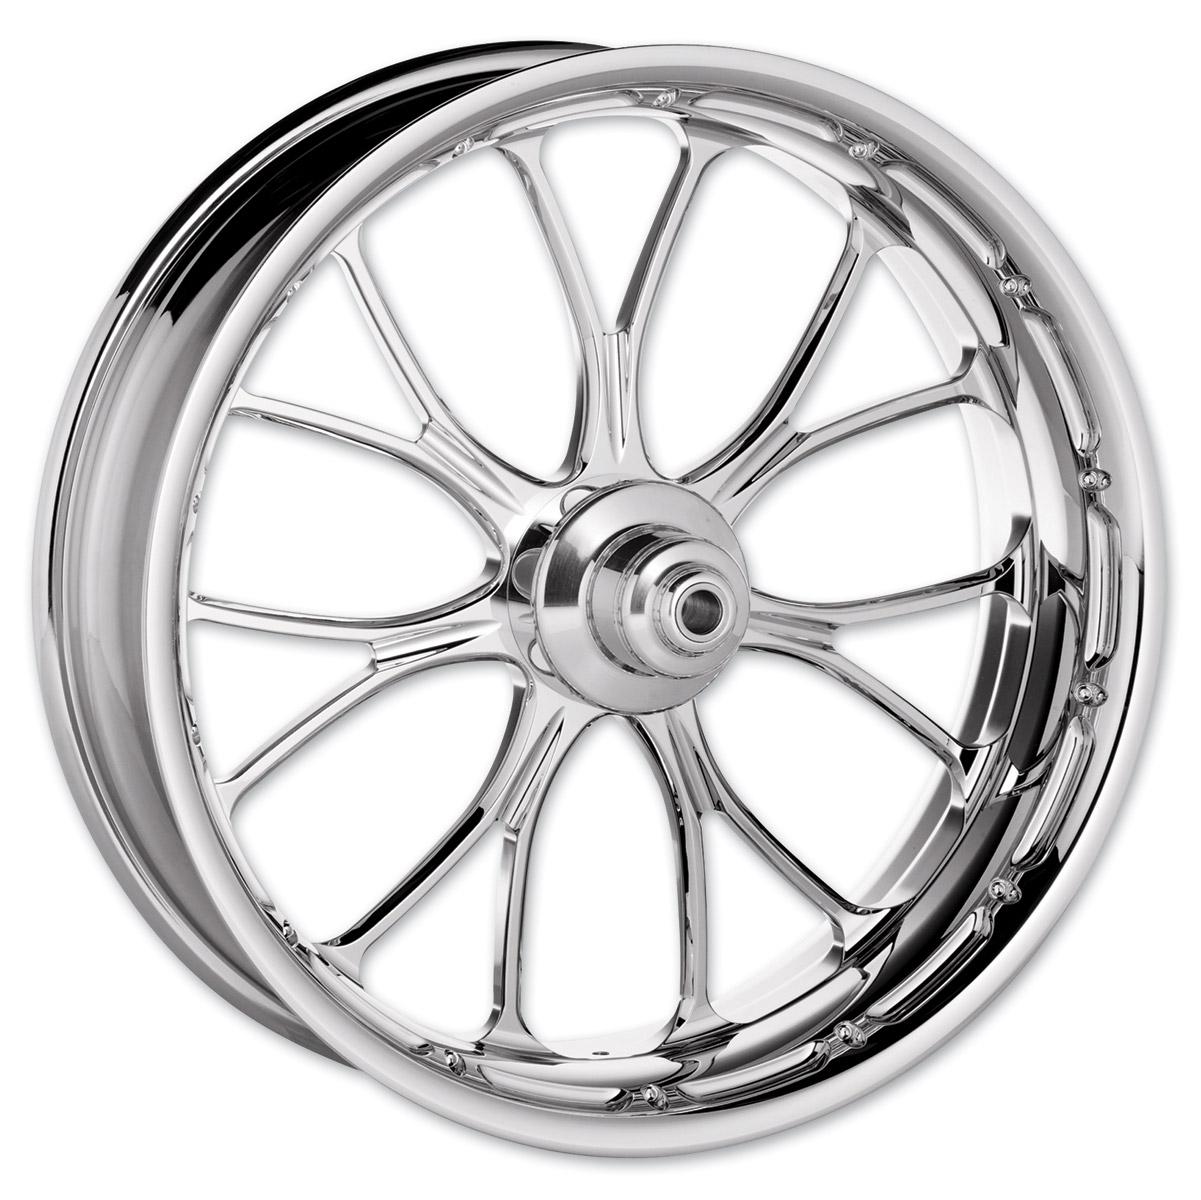 Performance Machine Heathen Rear Wheel 18″ X 5.5″ Chrome